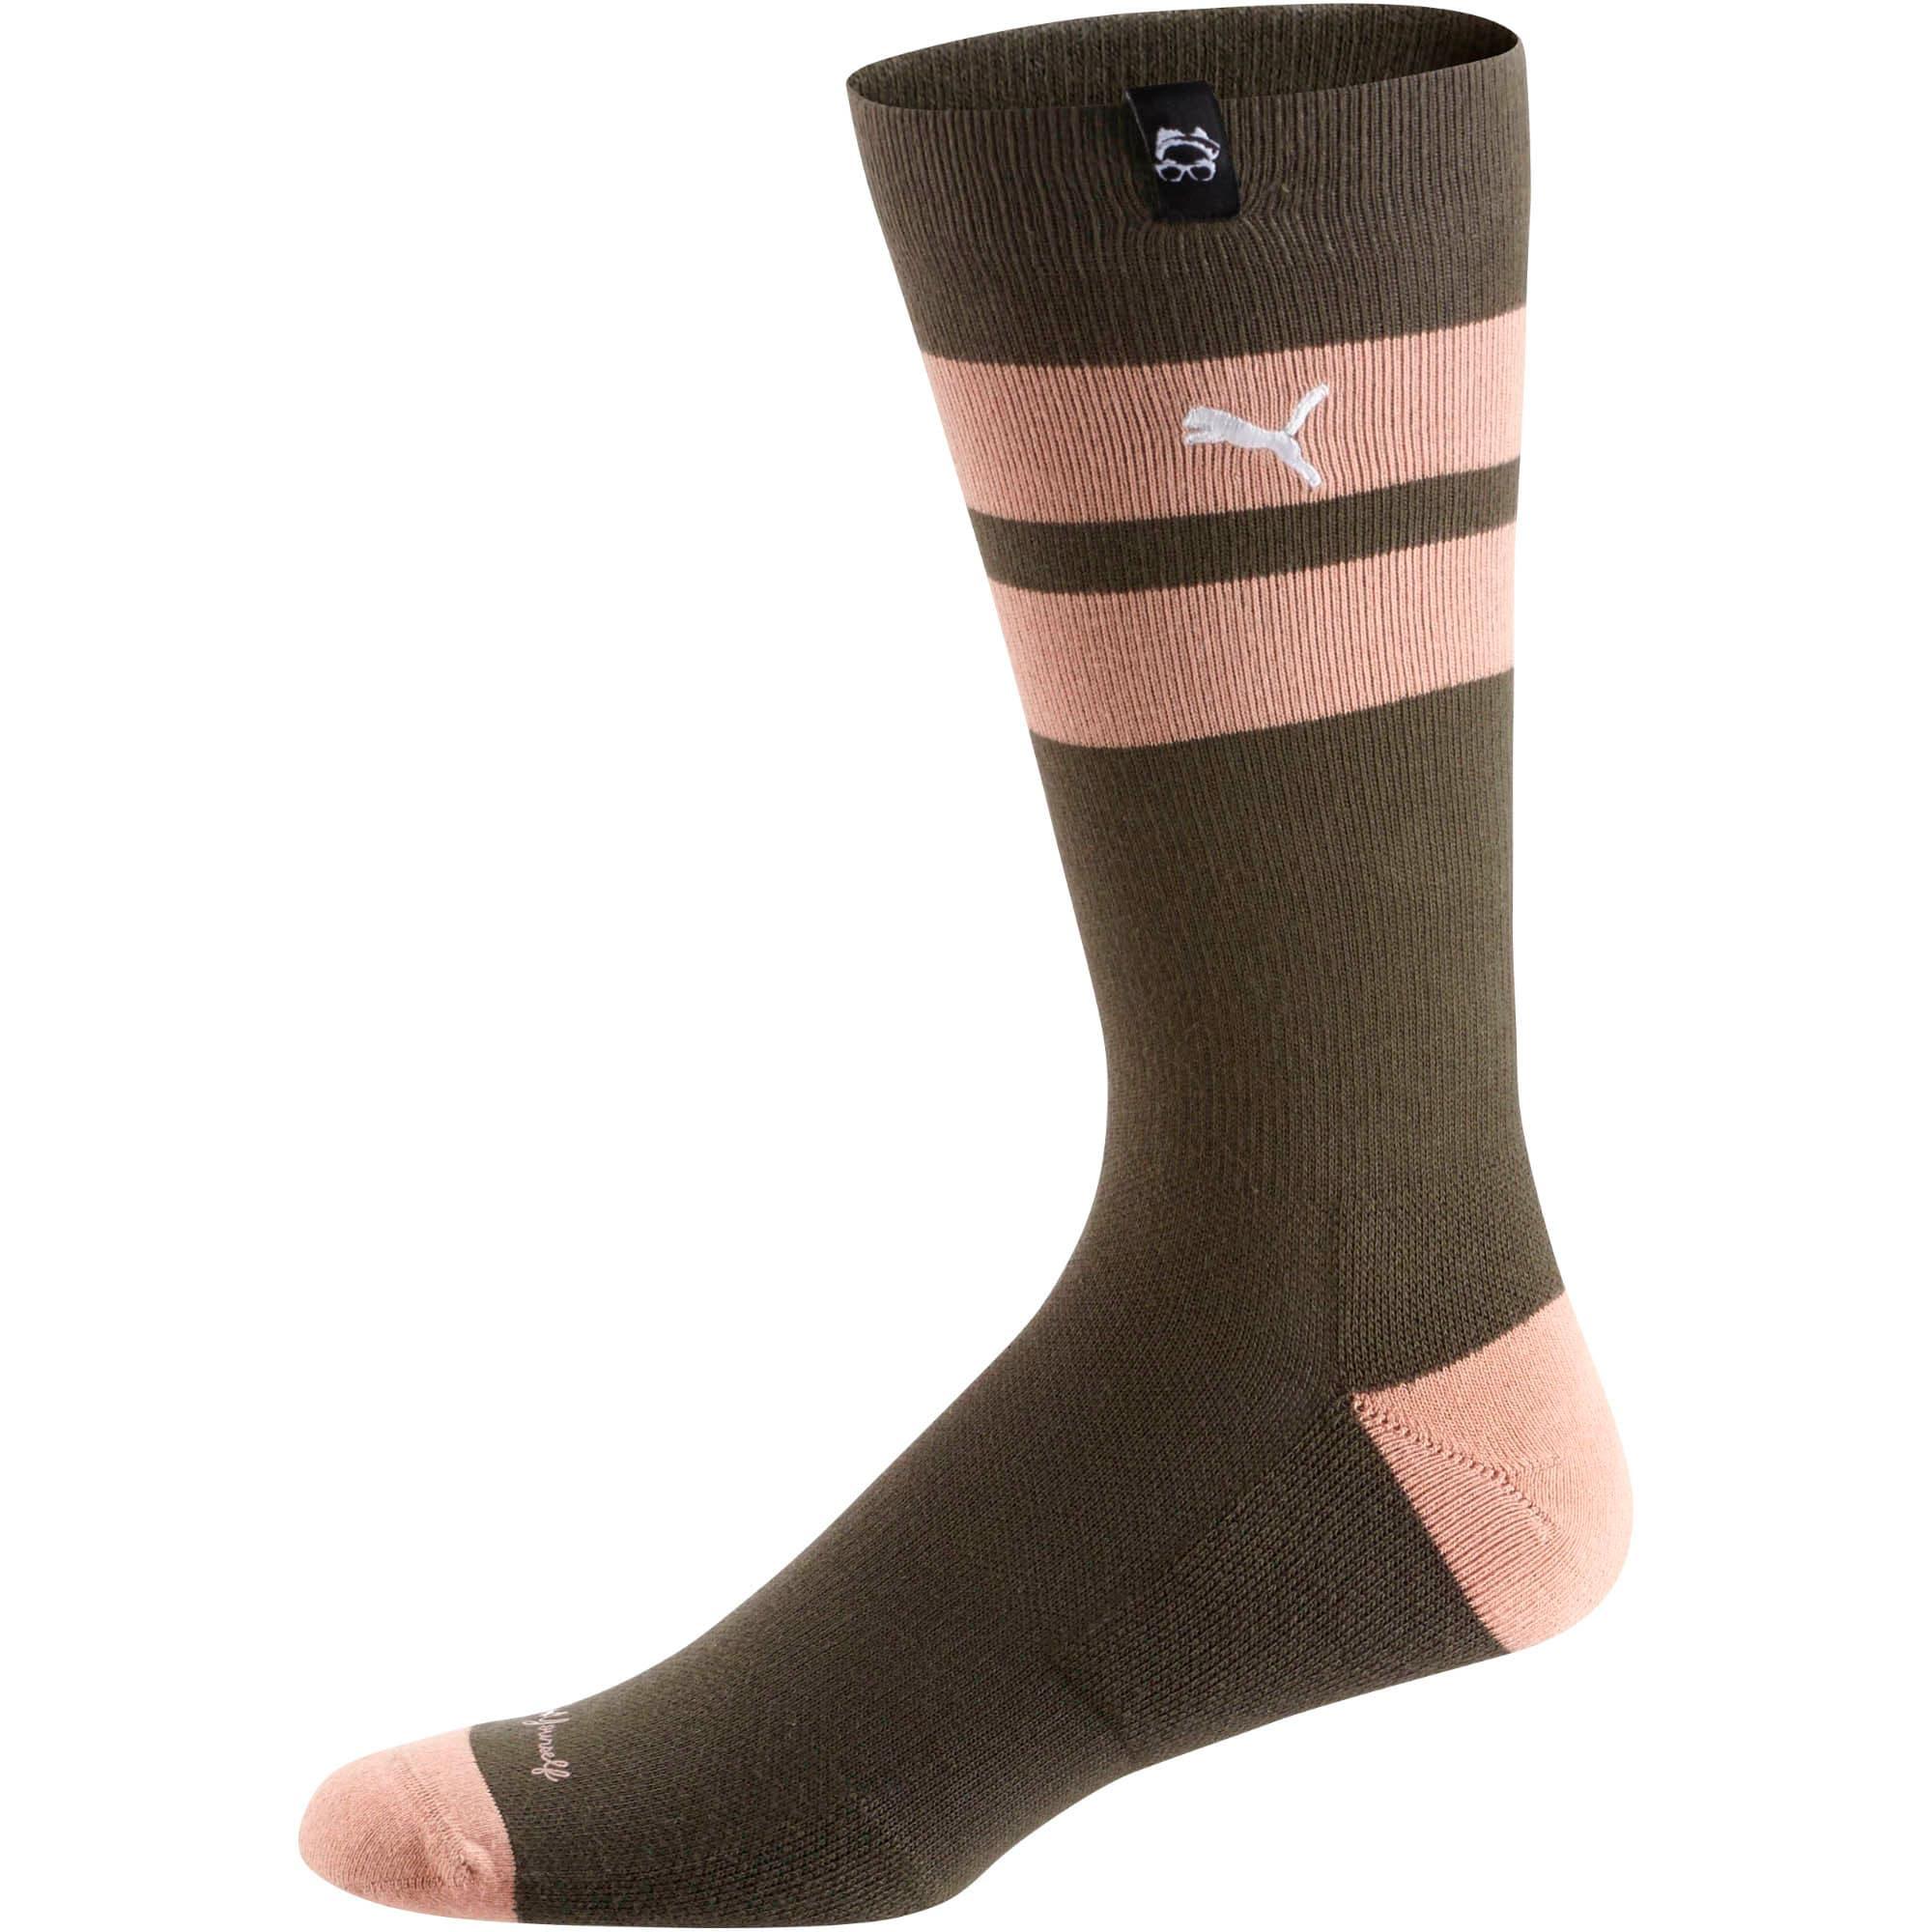 Thumbnail 1 of PUMA x EMORY JONES Men's Crew Socks [1 Pair], Forest-Coral-White, medium